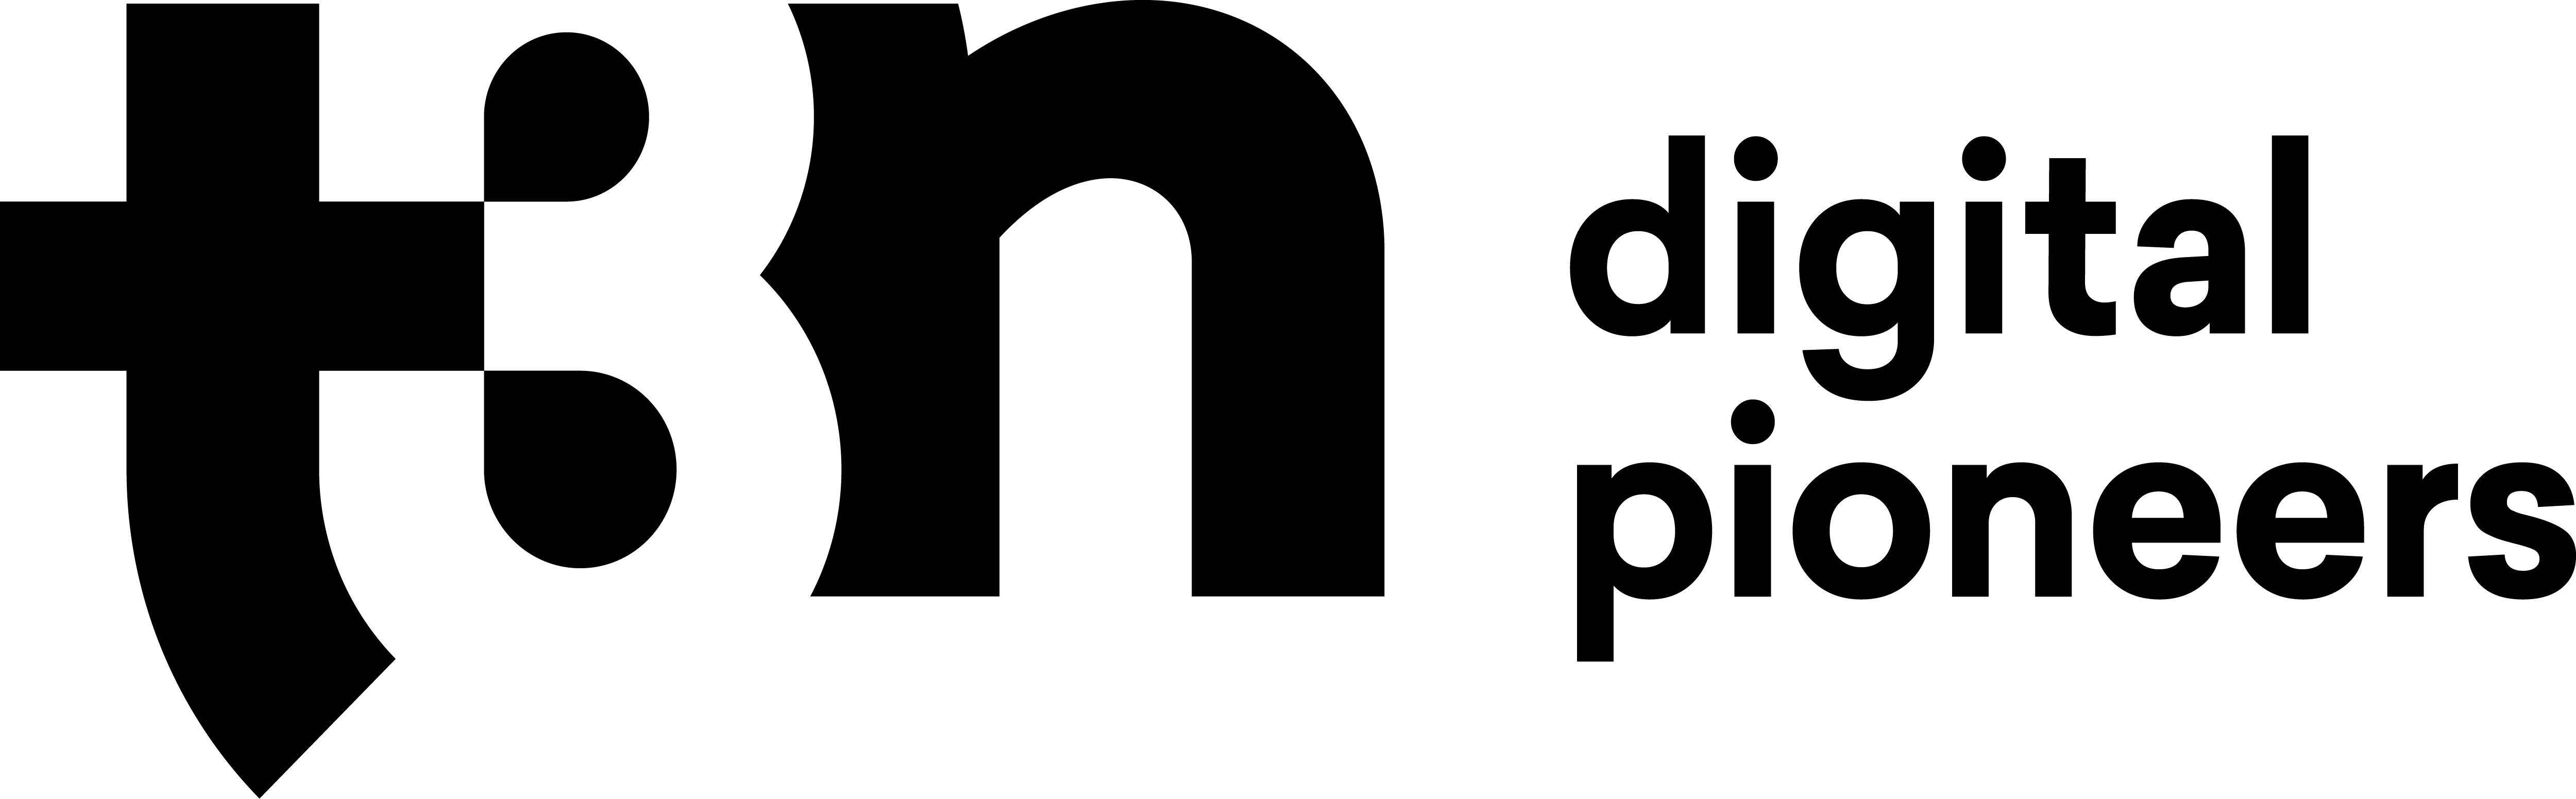 clip library stock press clip logo #101638428